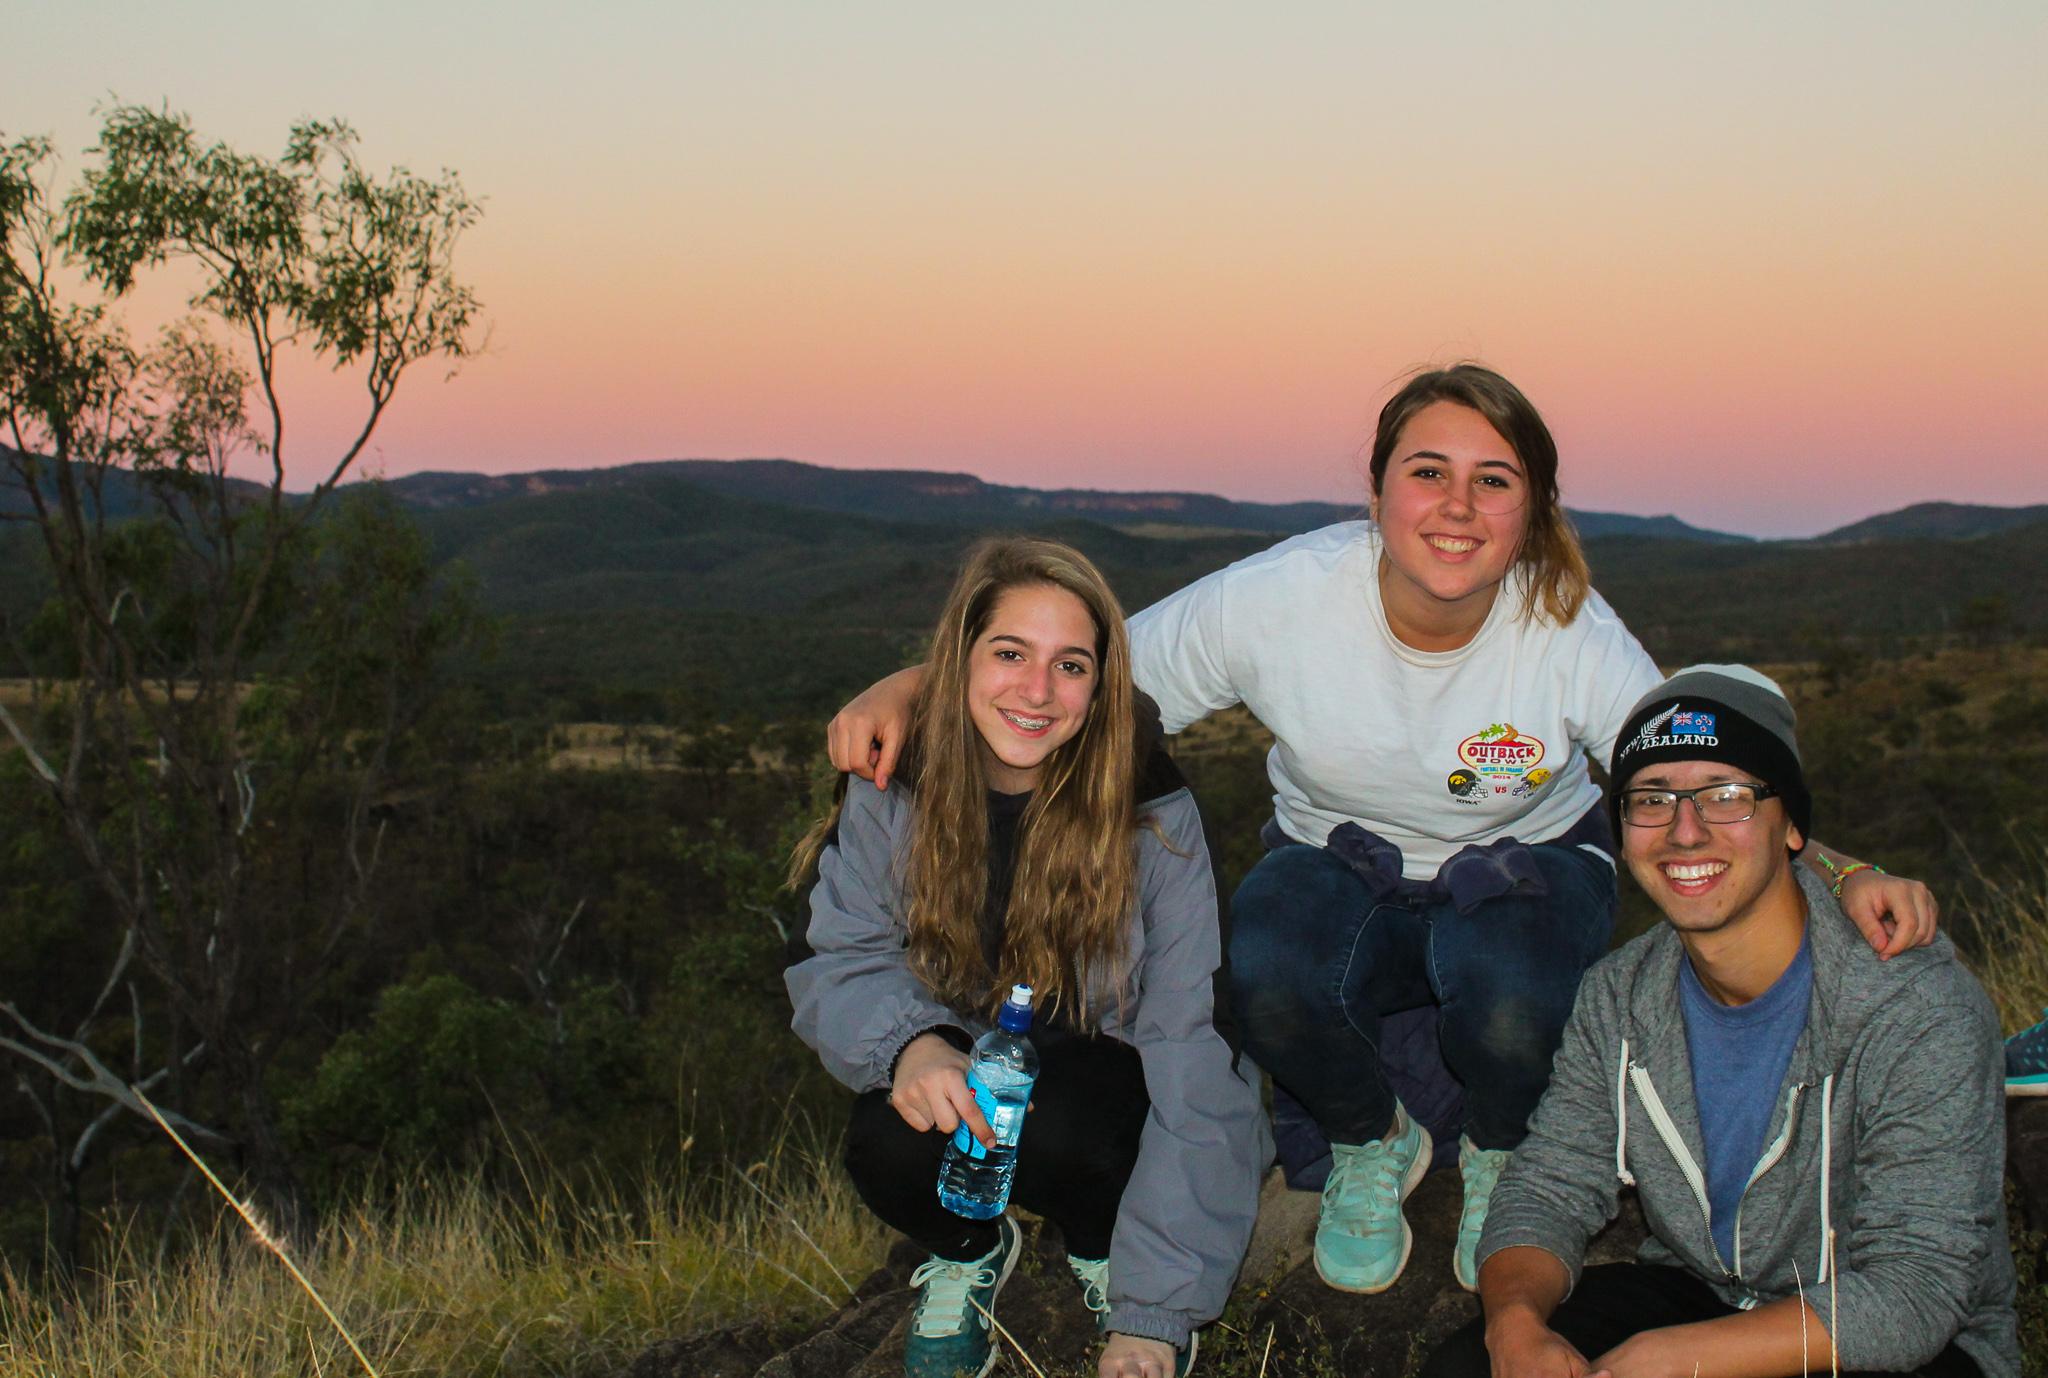 Summer Program - Travel And Tourism | Travel For Teens: Australia for Older Teens